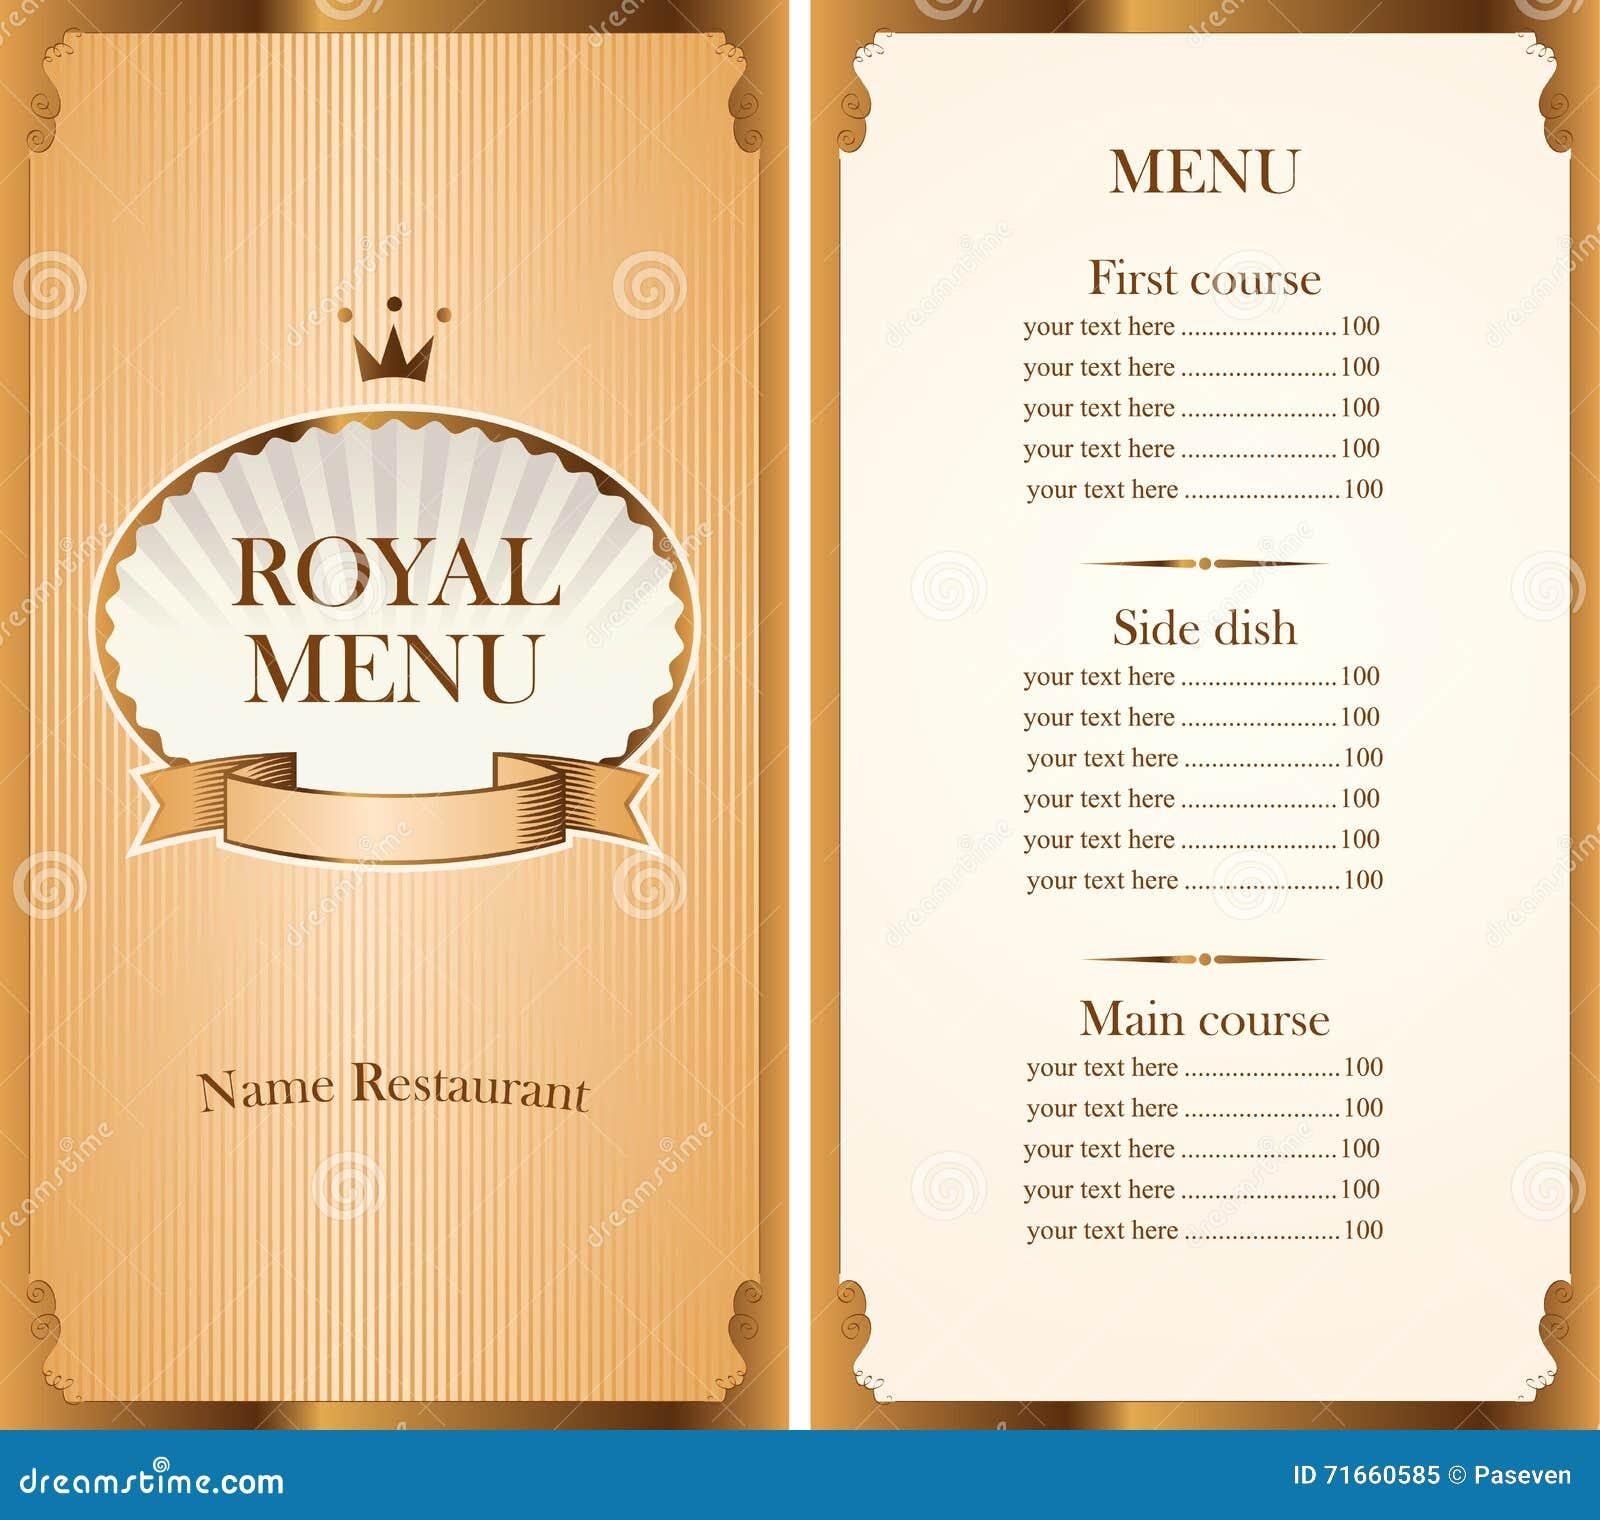 Prix Cafe Royal